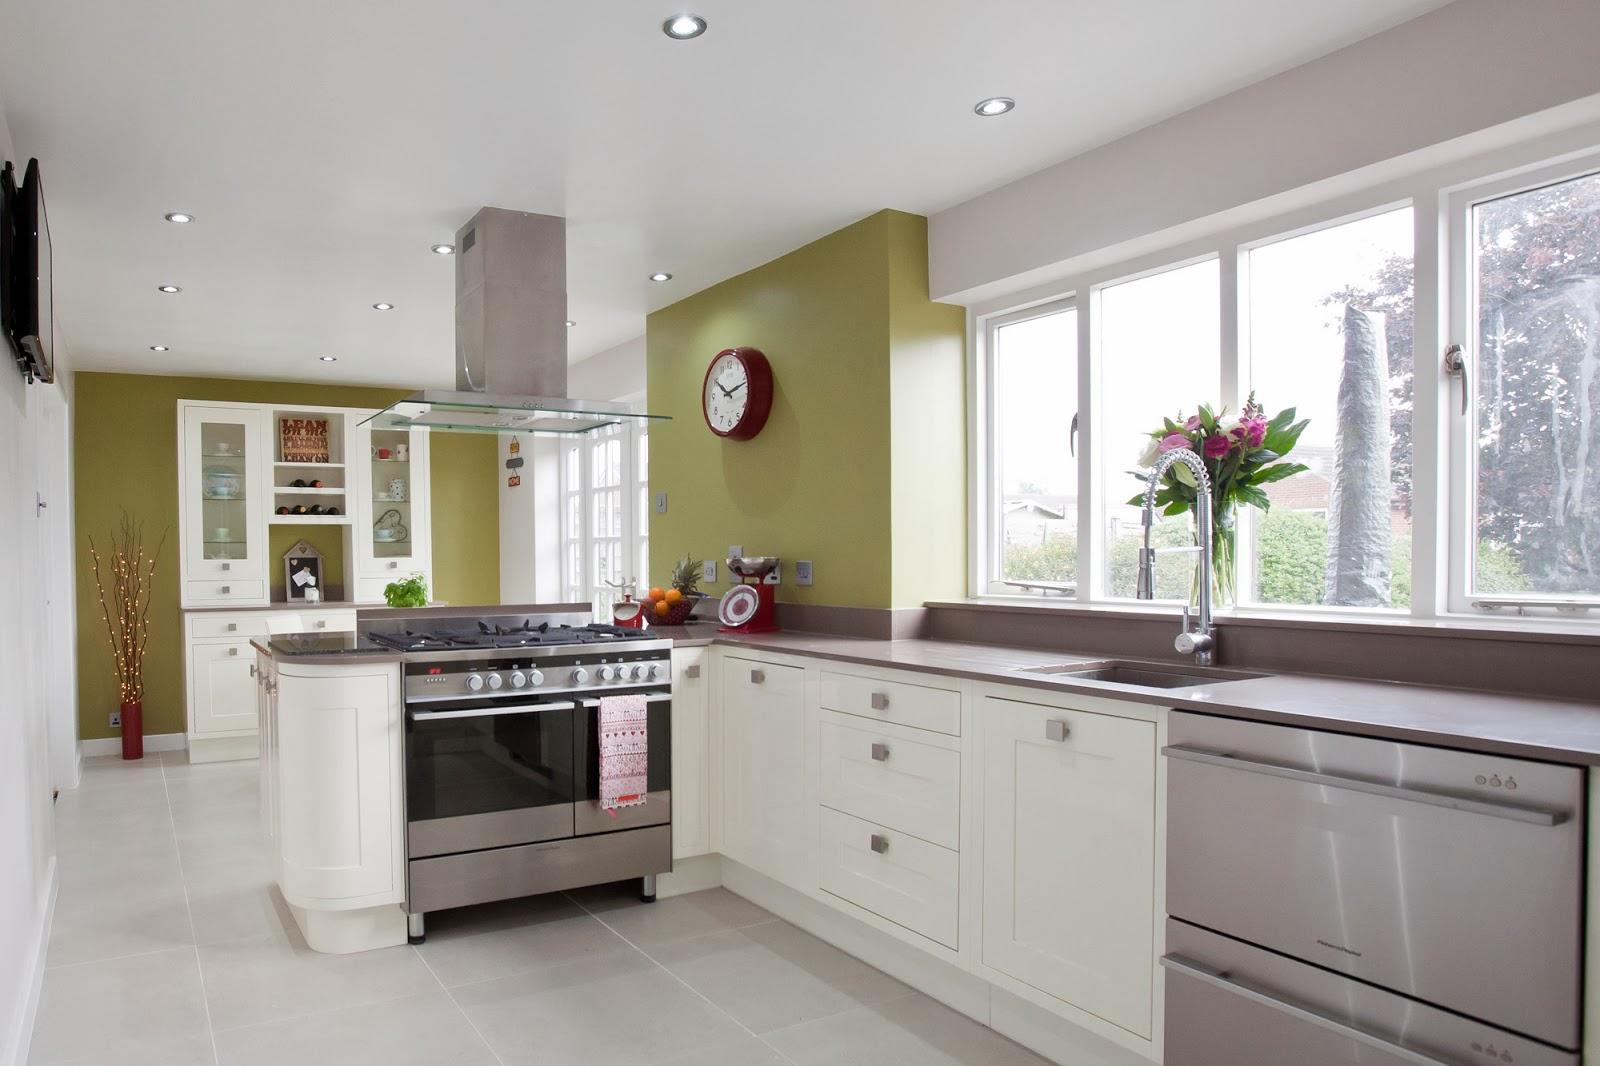 Taditional Twist, Kitchens, Traditional Kitchens, Charles Rennie Mackintosh  Kitchens, Baking, Cooking